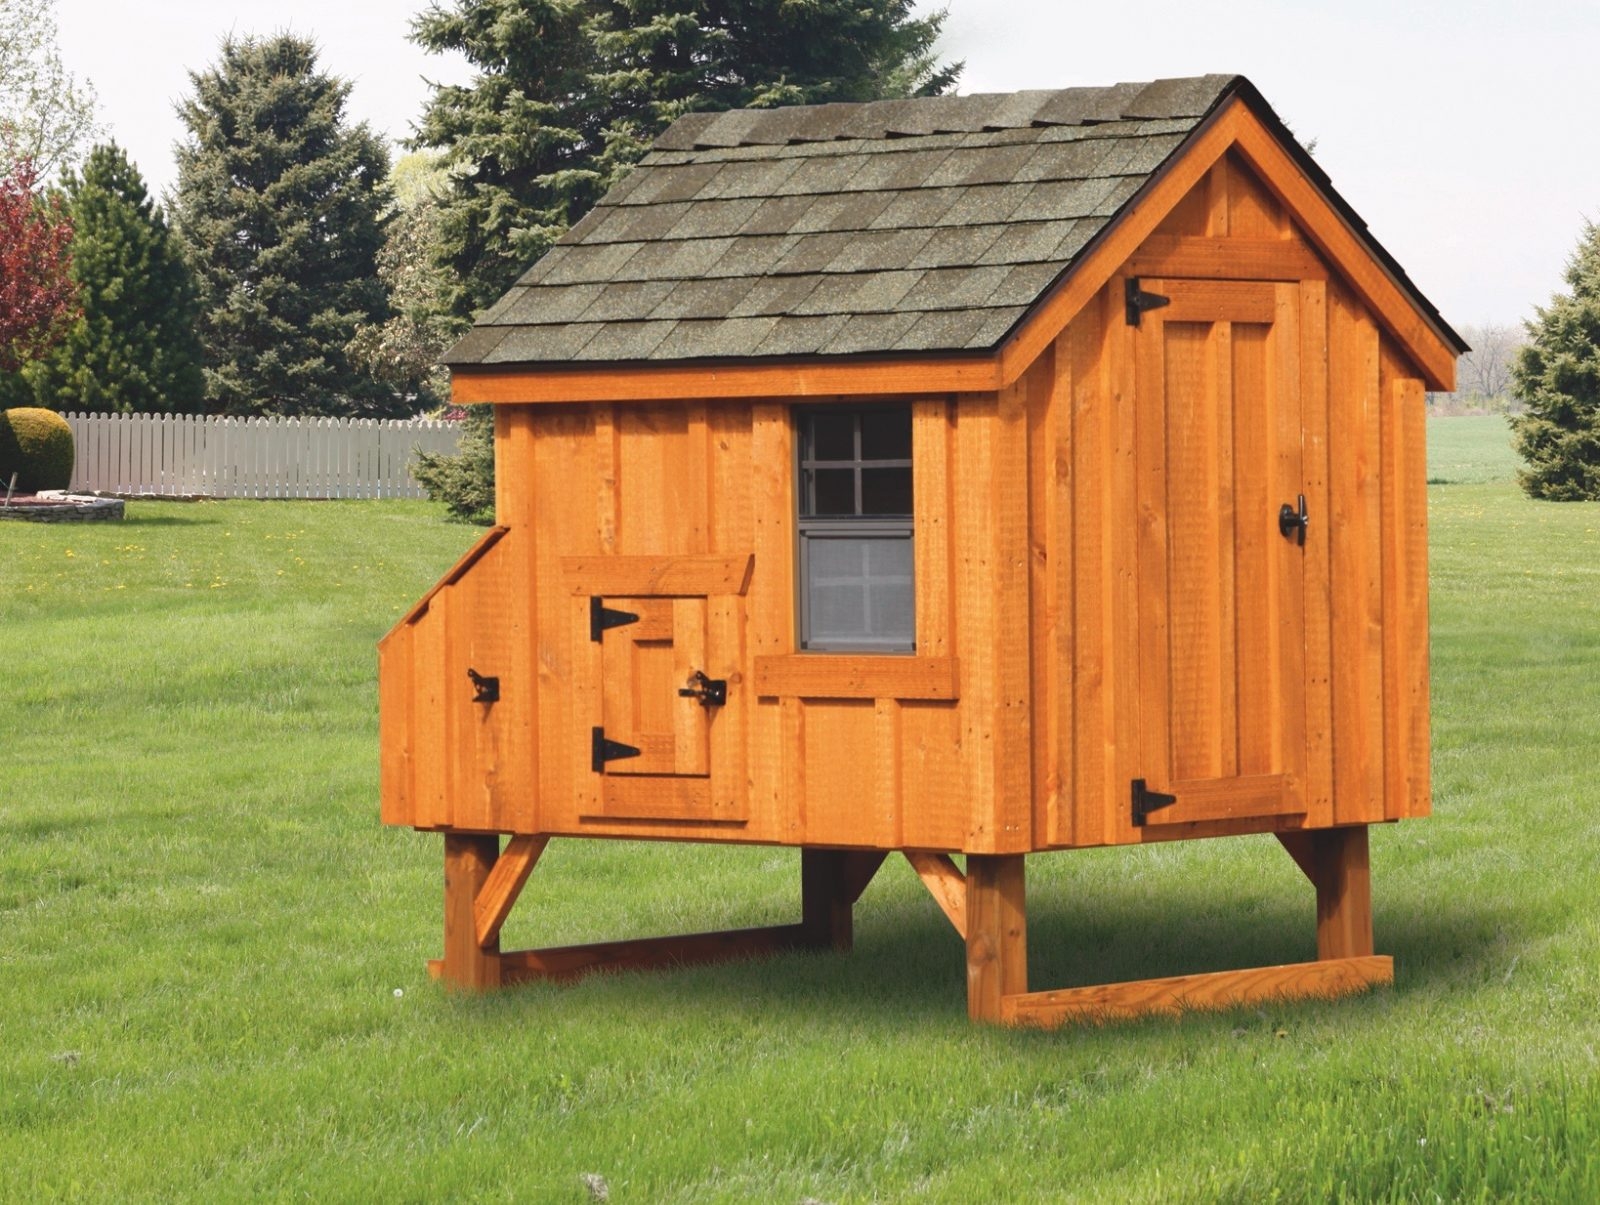 Backyard Chicken Coops Chicken Coops For Sale Online